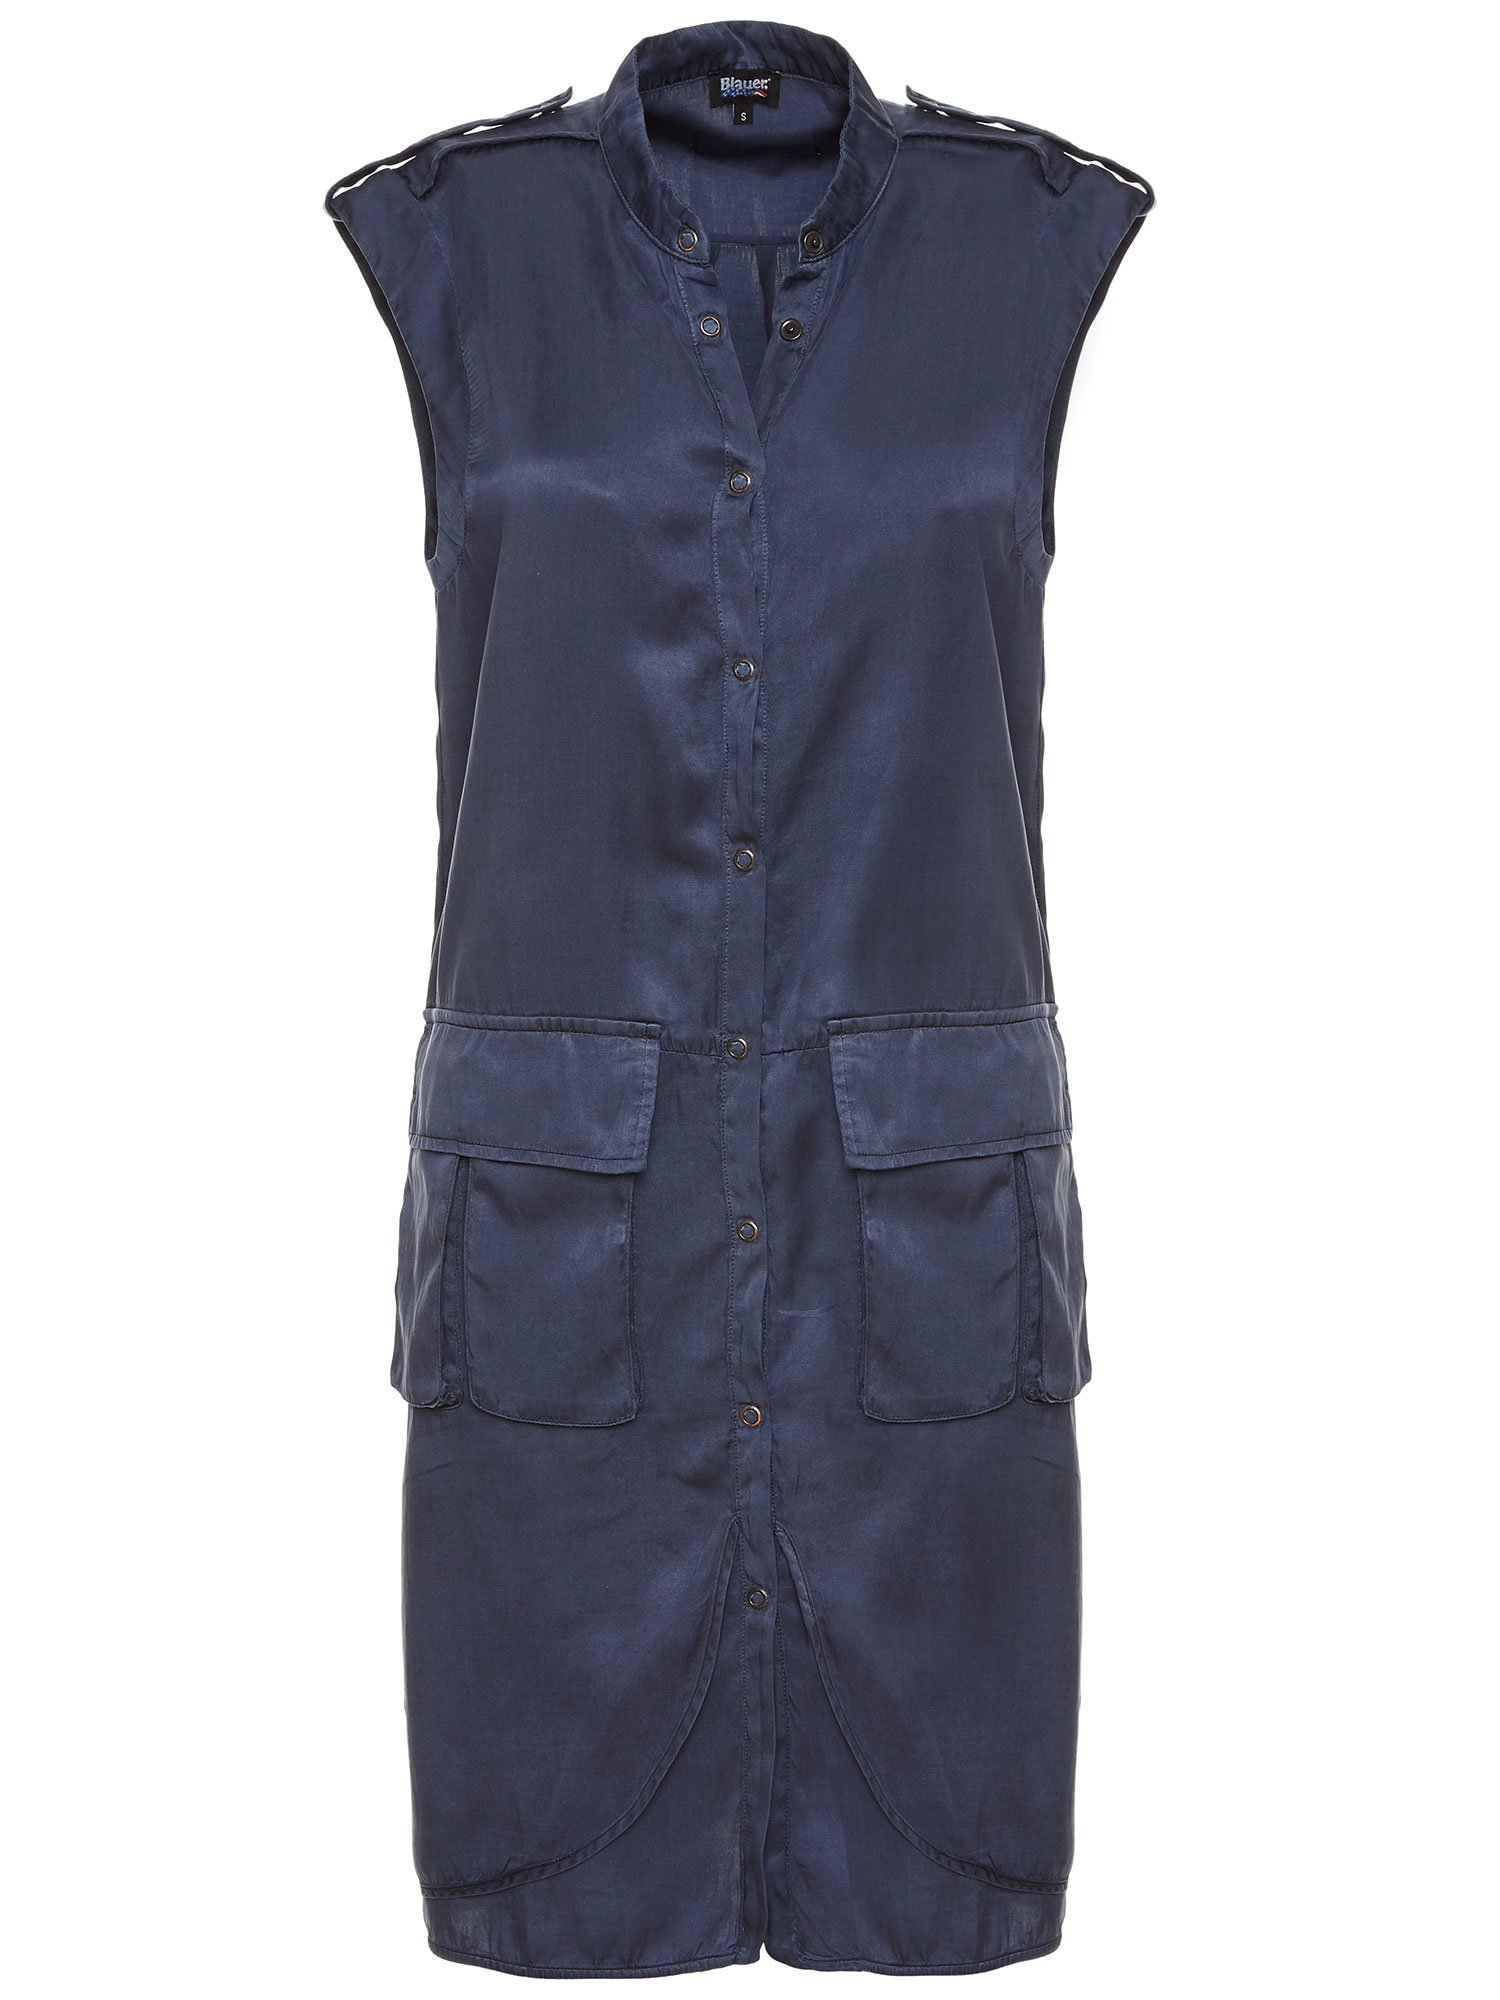 Blauer - SLEEVELESS DRESS WITH LARGE POCKETS - Blue Egeo Sea - Blauer